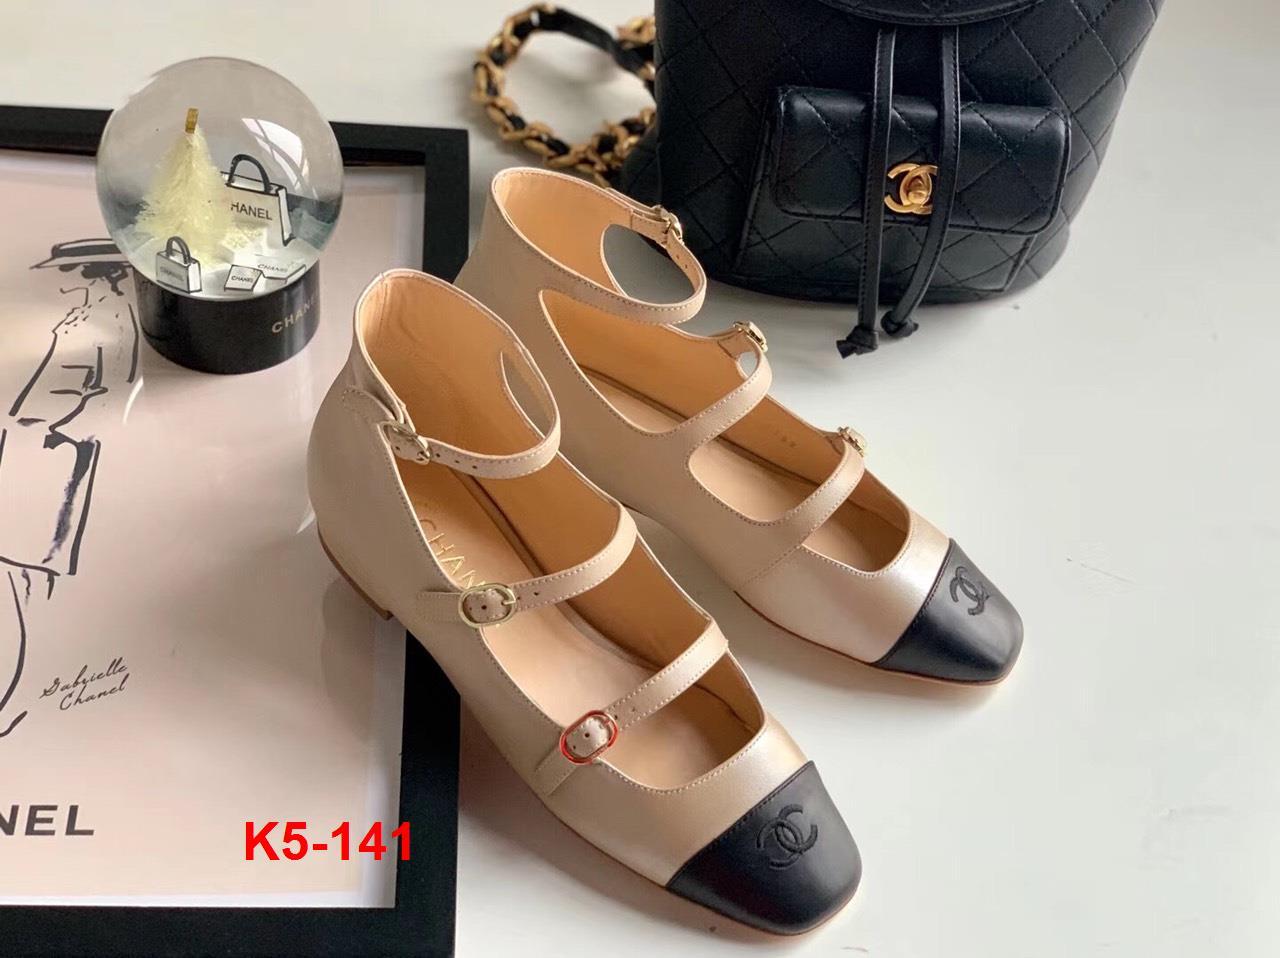 K5-141 Chanel sandal bệt siêu cấp